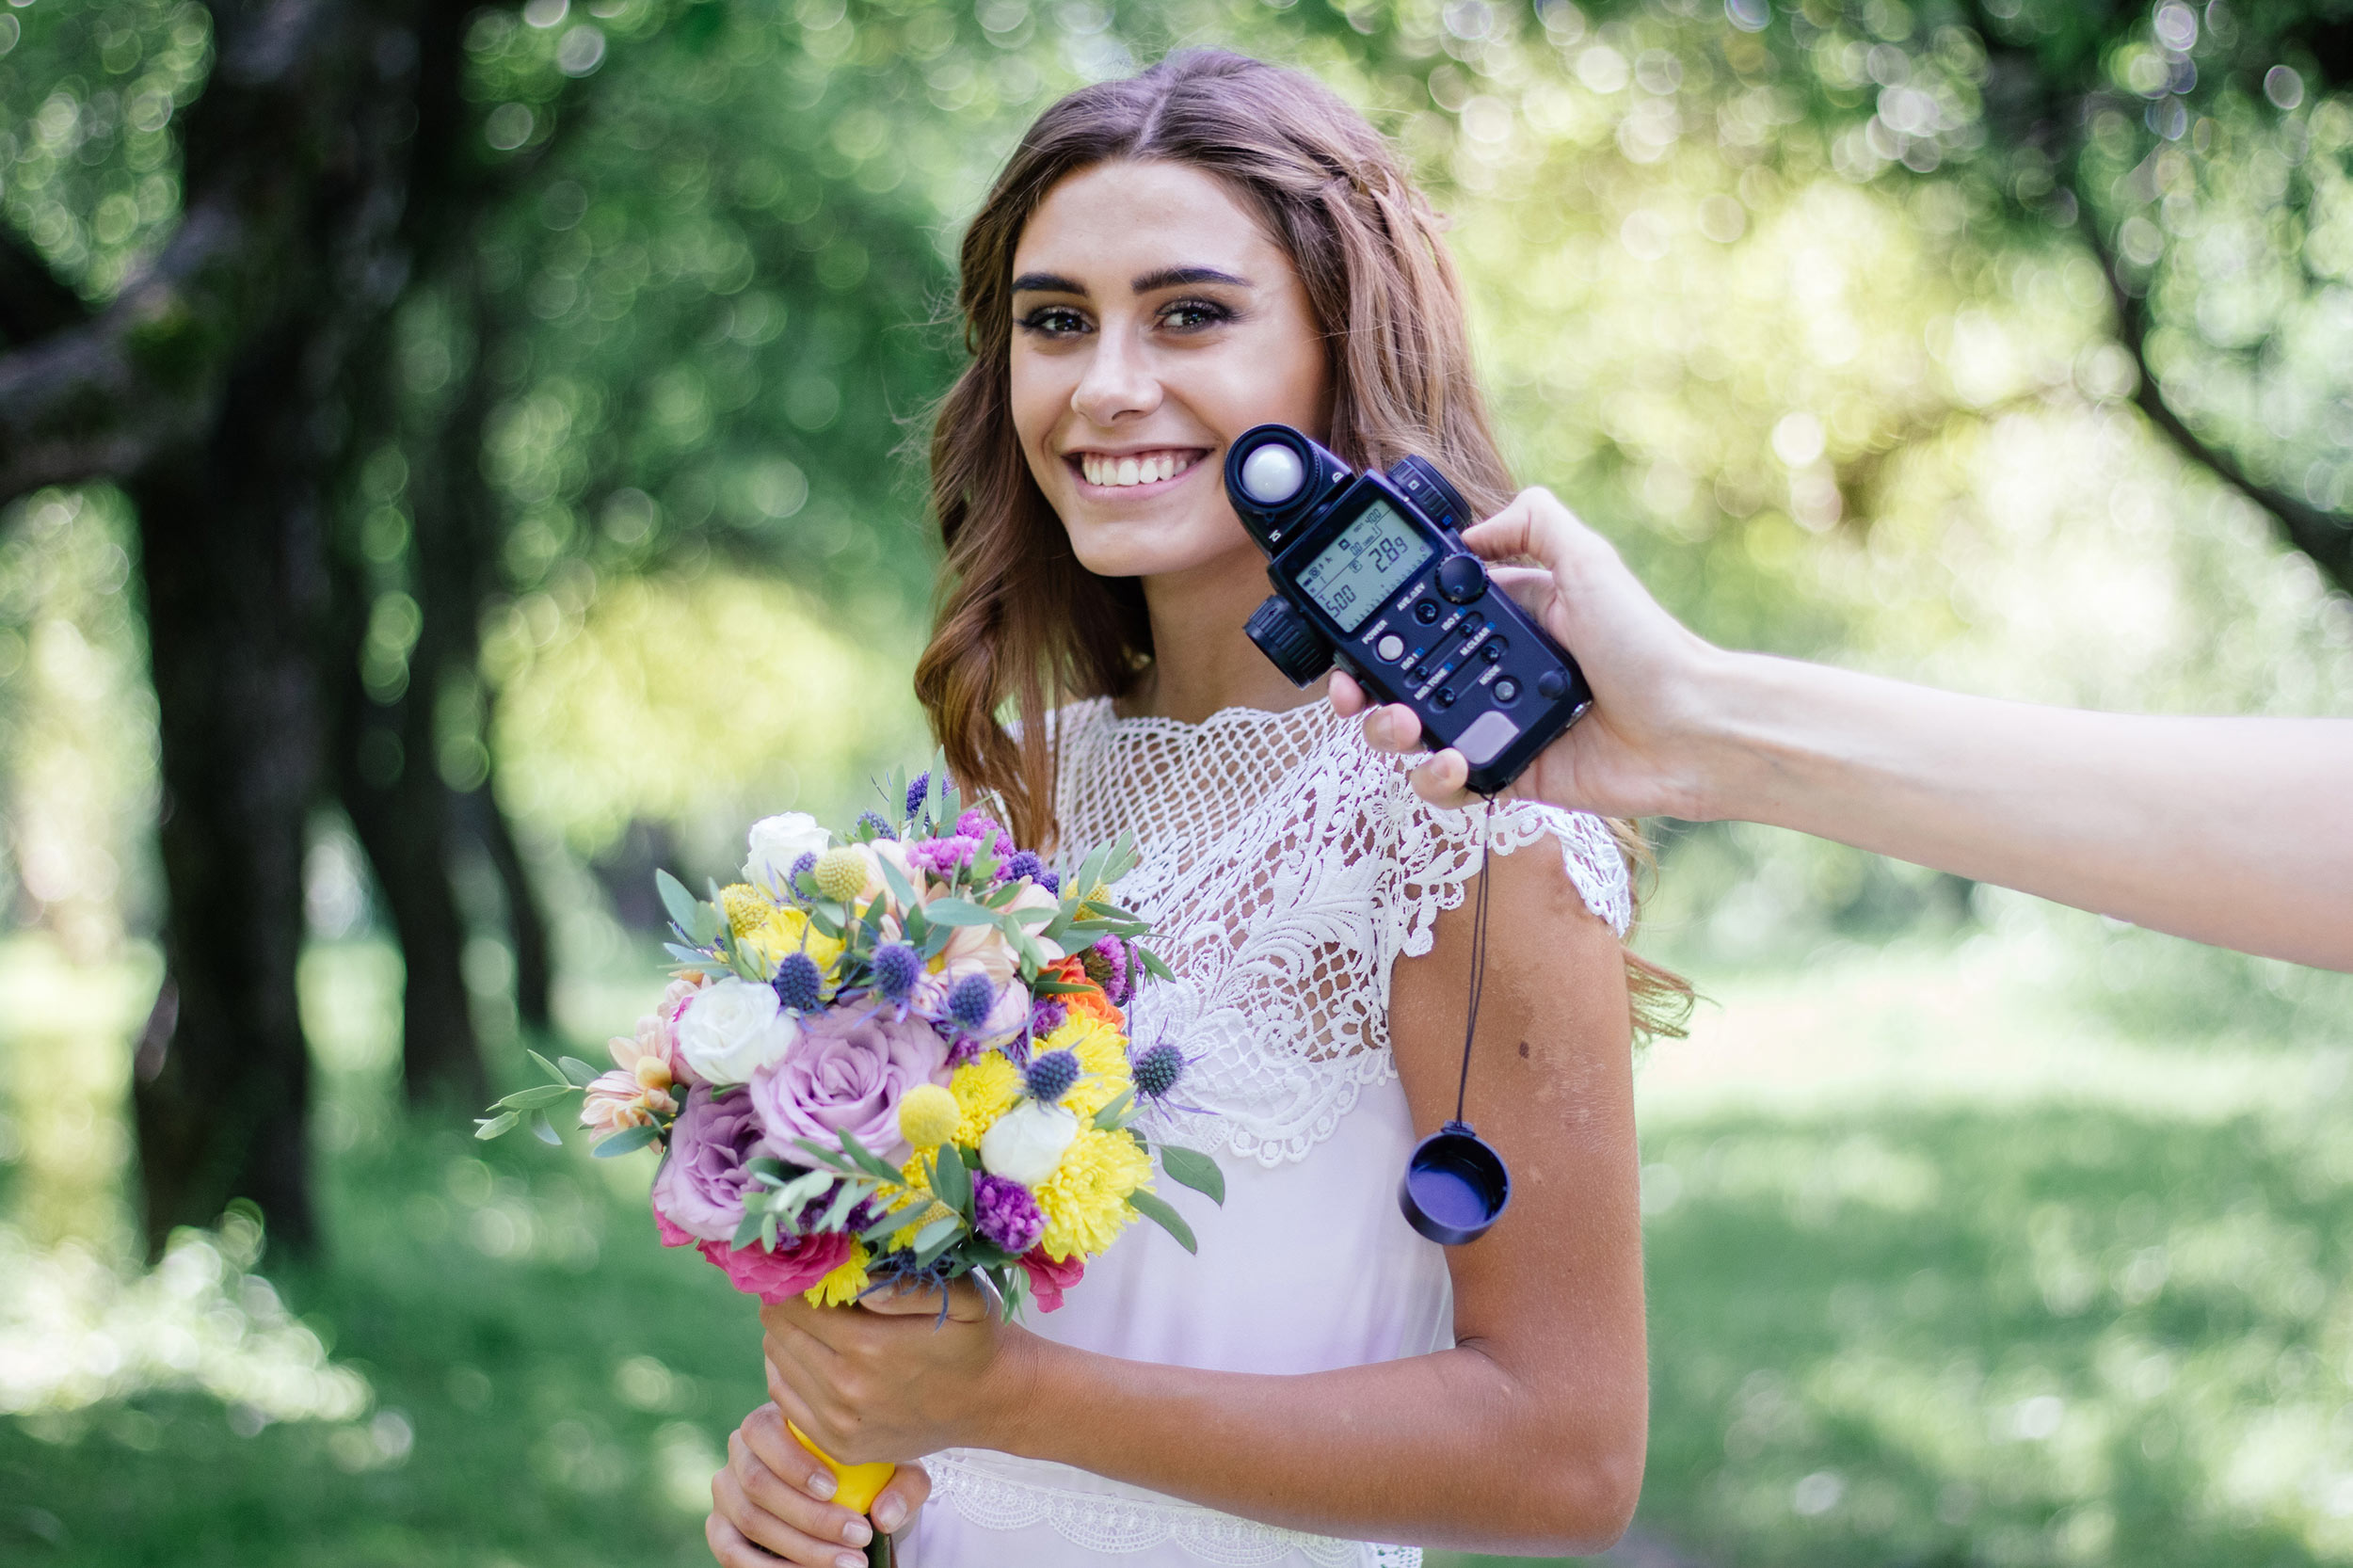 Model having the light at her exact location assessed using a handheld light meter.